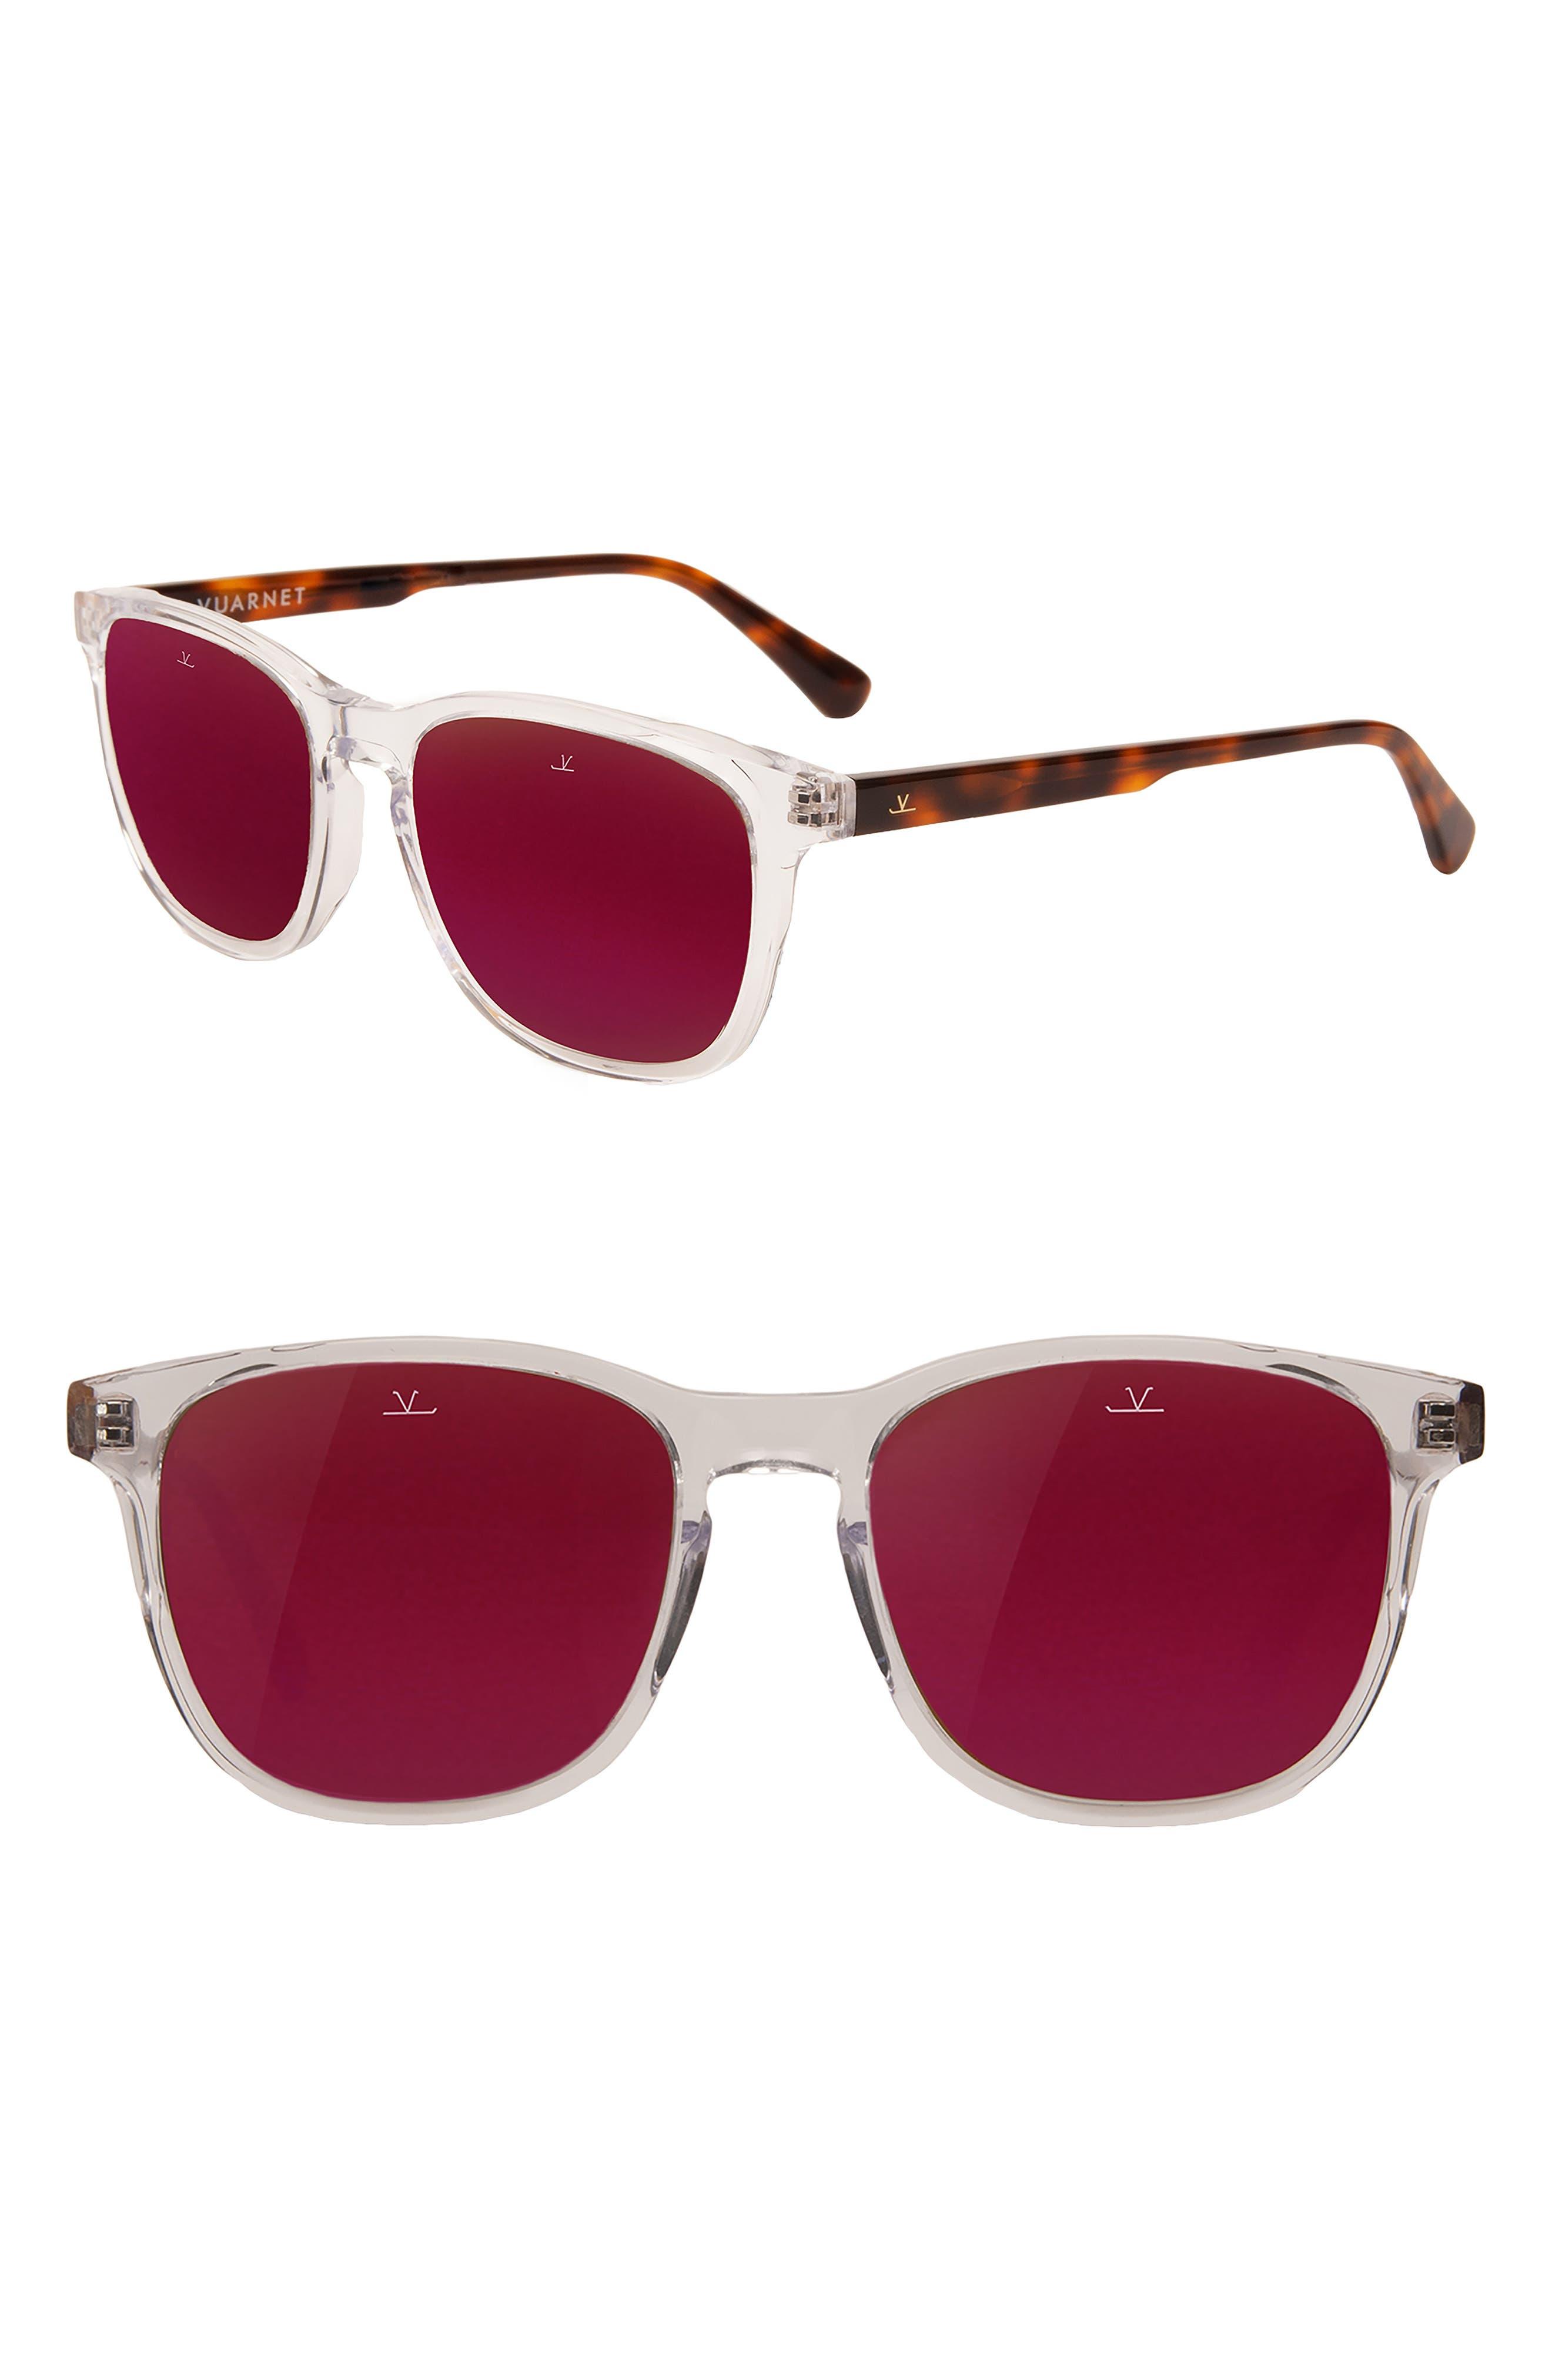 District Medium 53mm Sunglasses,                         Main,                         color, UNILYNX PURPLE FLASH